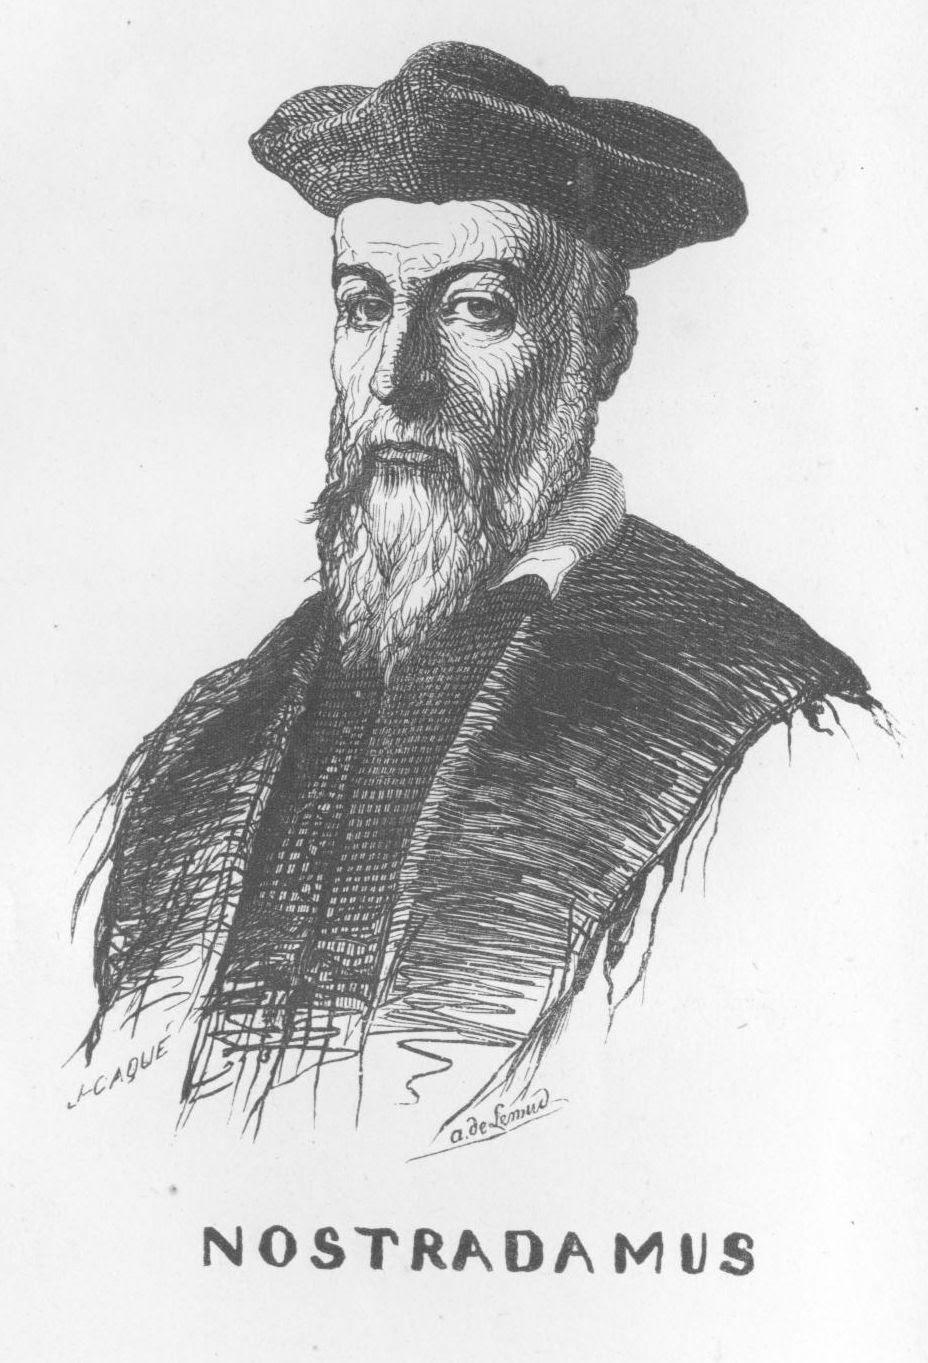 nostradamus by lemud Nostradamus